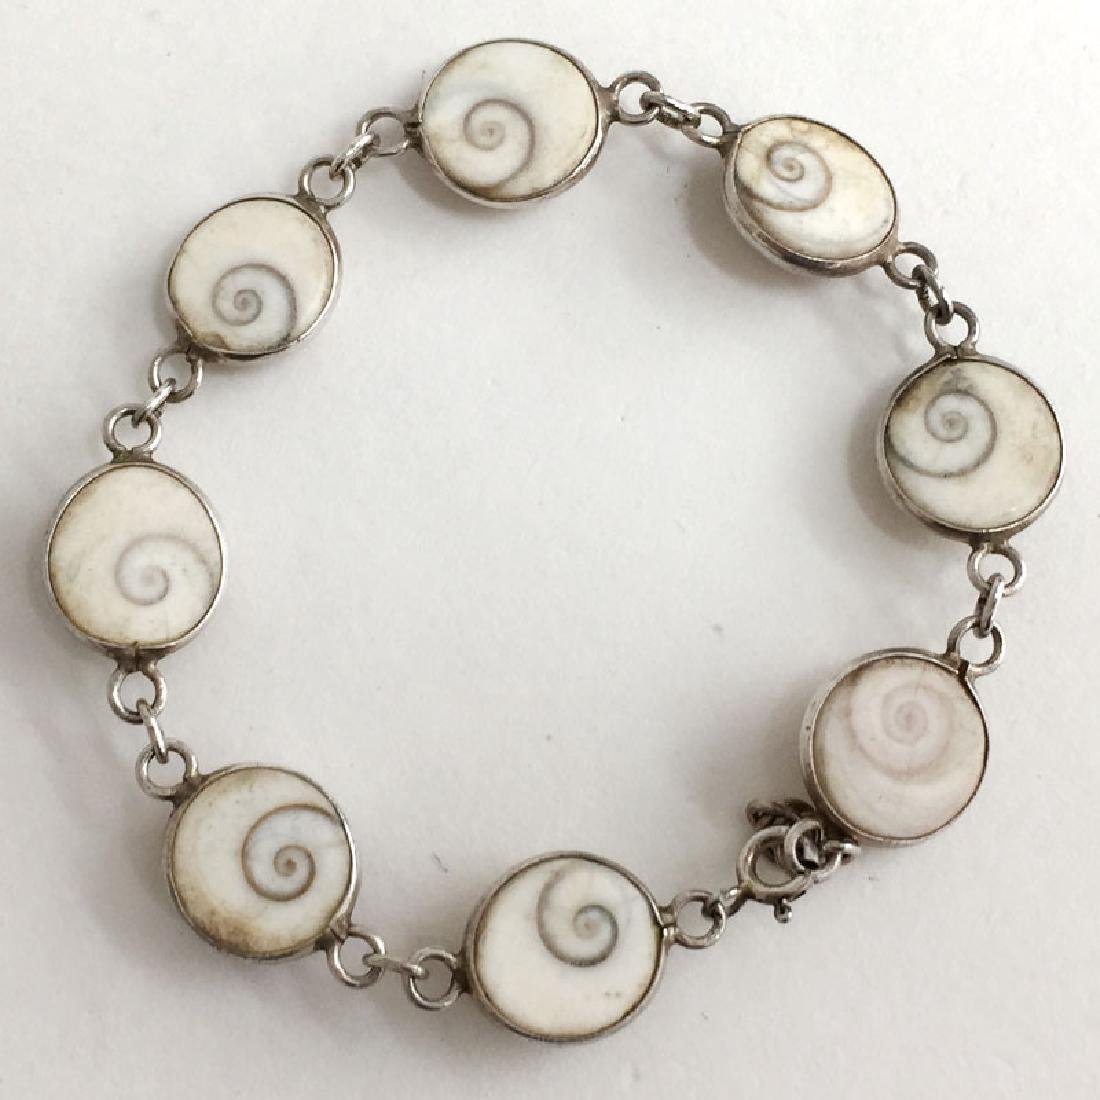 Vintage sterling silver shell links flexible bracelet